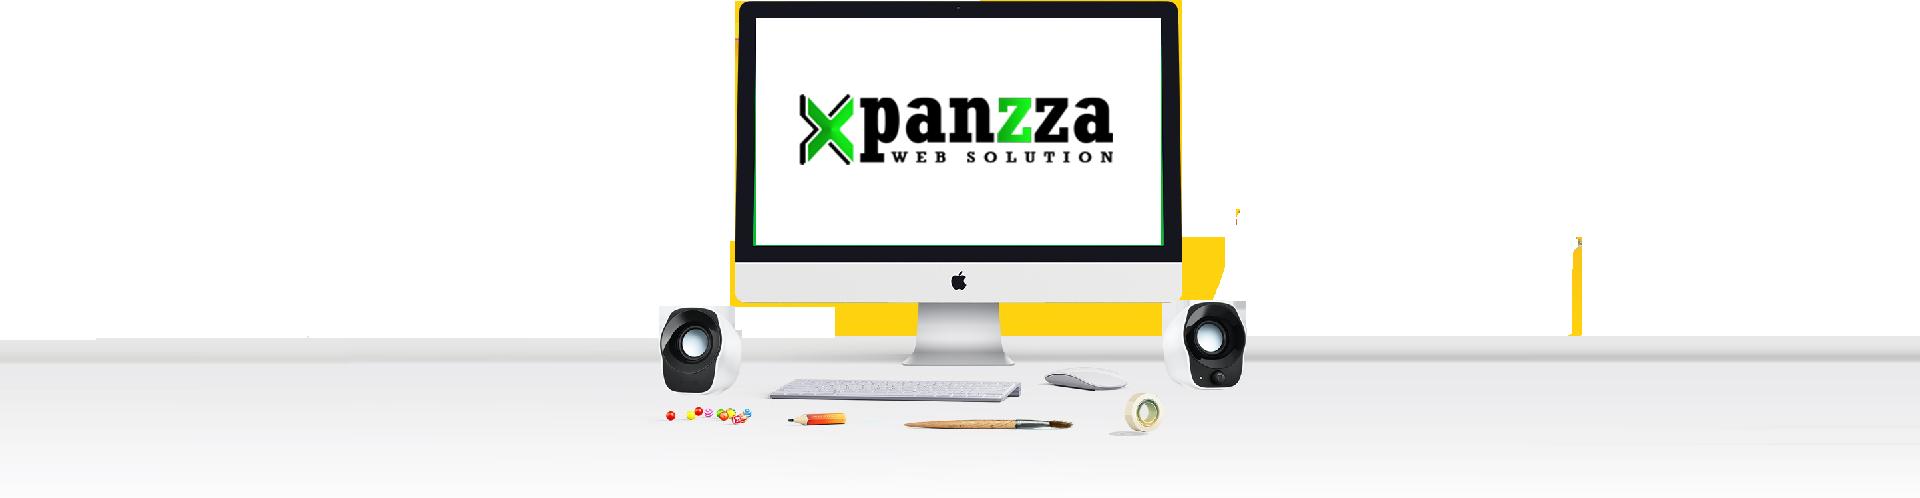 xpanzza background image 1